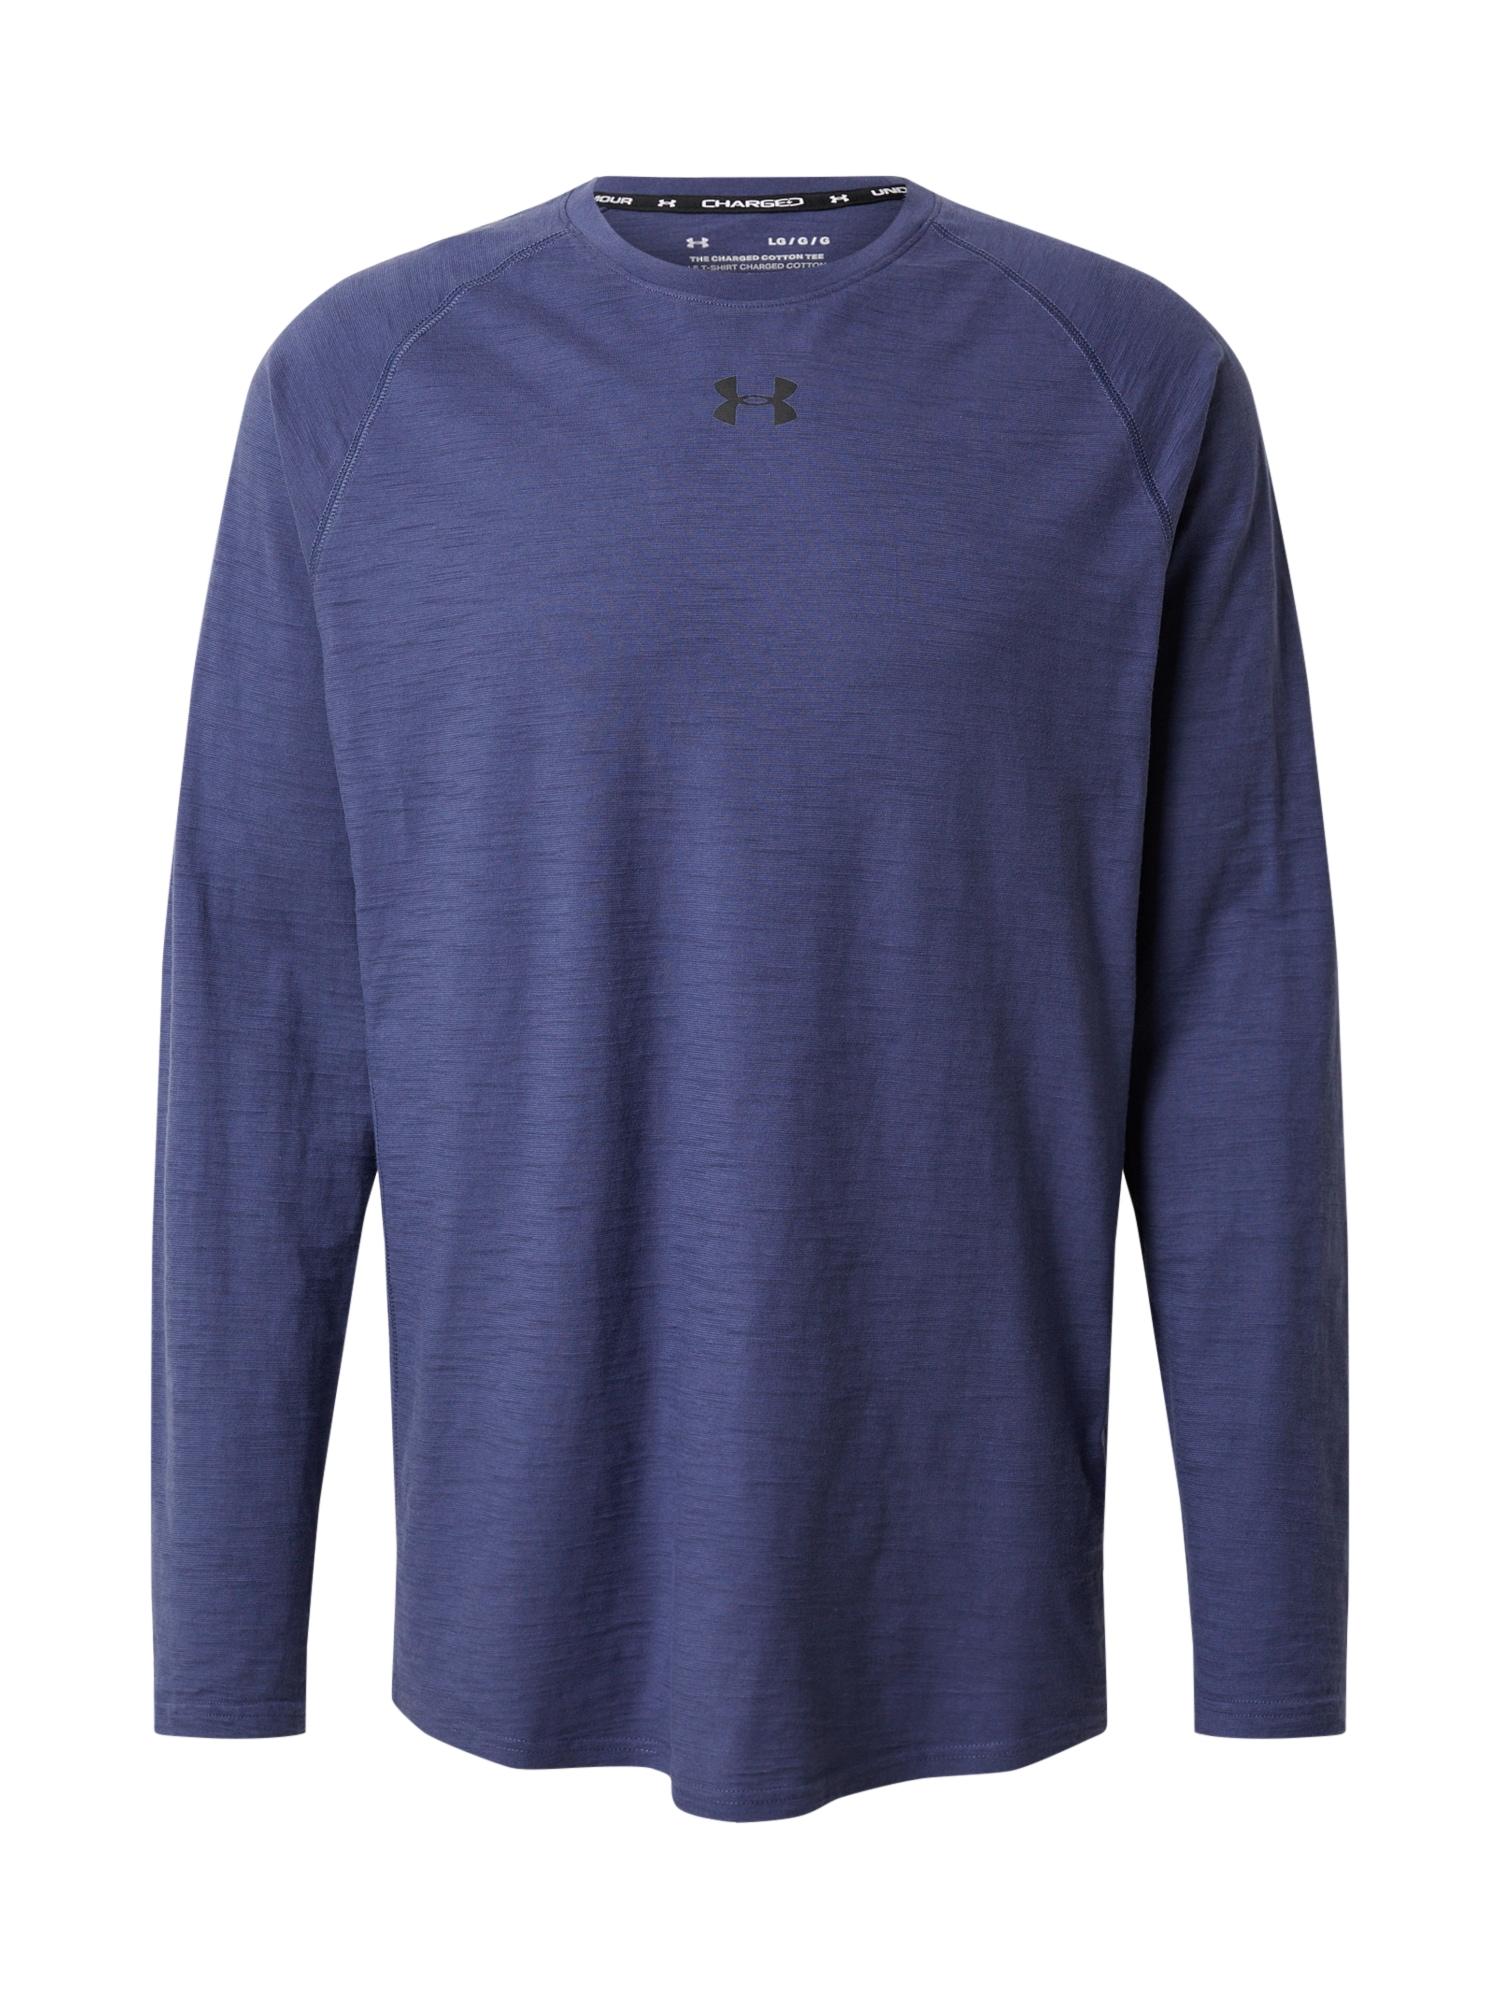 UNDER ARMOUR Funkčné tričko 'Charged Cotton'  námornícka modrá